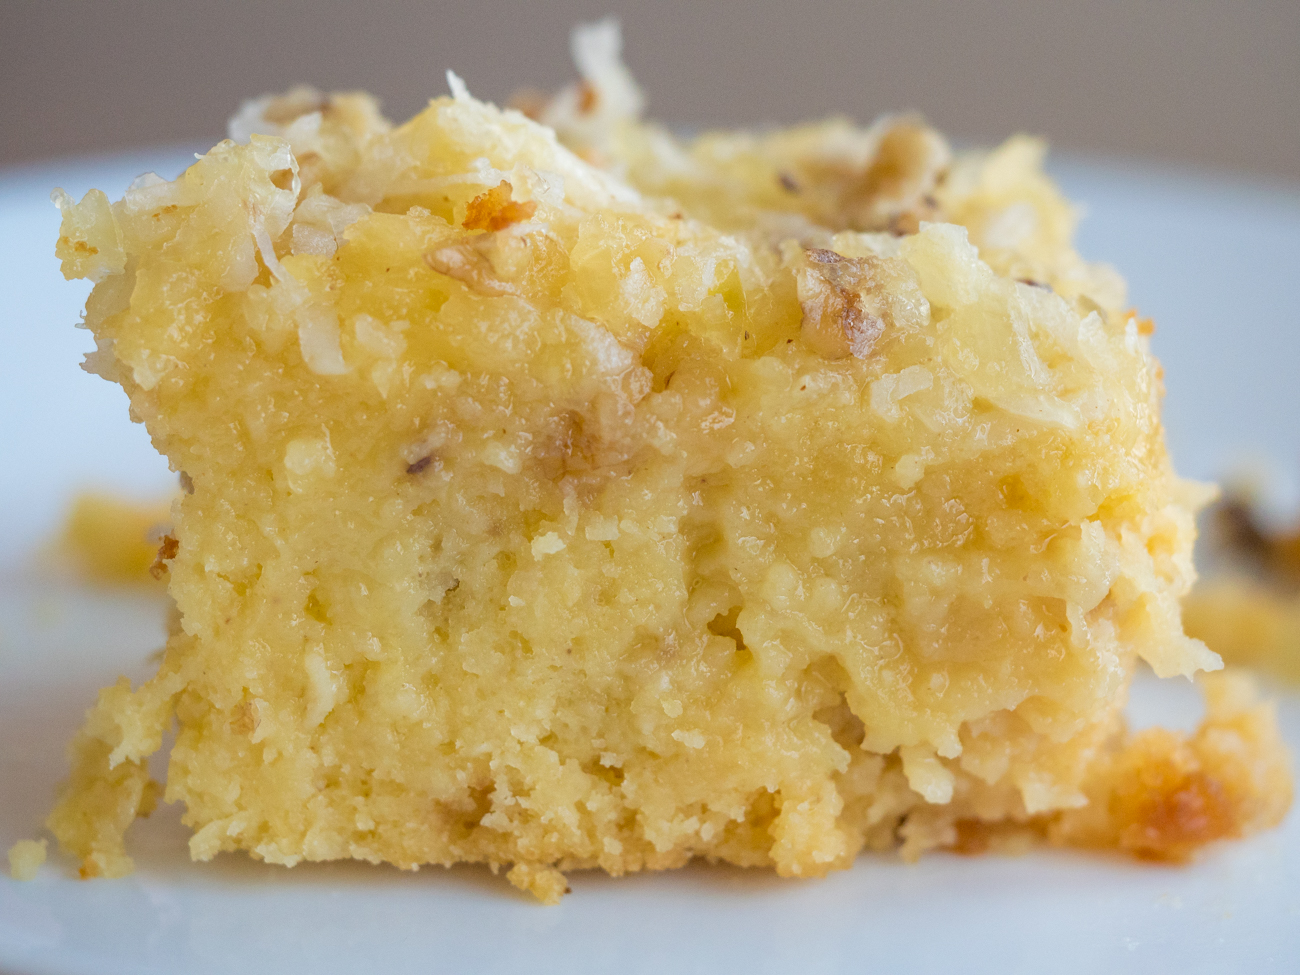 Slow Cooker Pineapple Spoon Cake Horizontal (10 of 11)